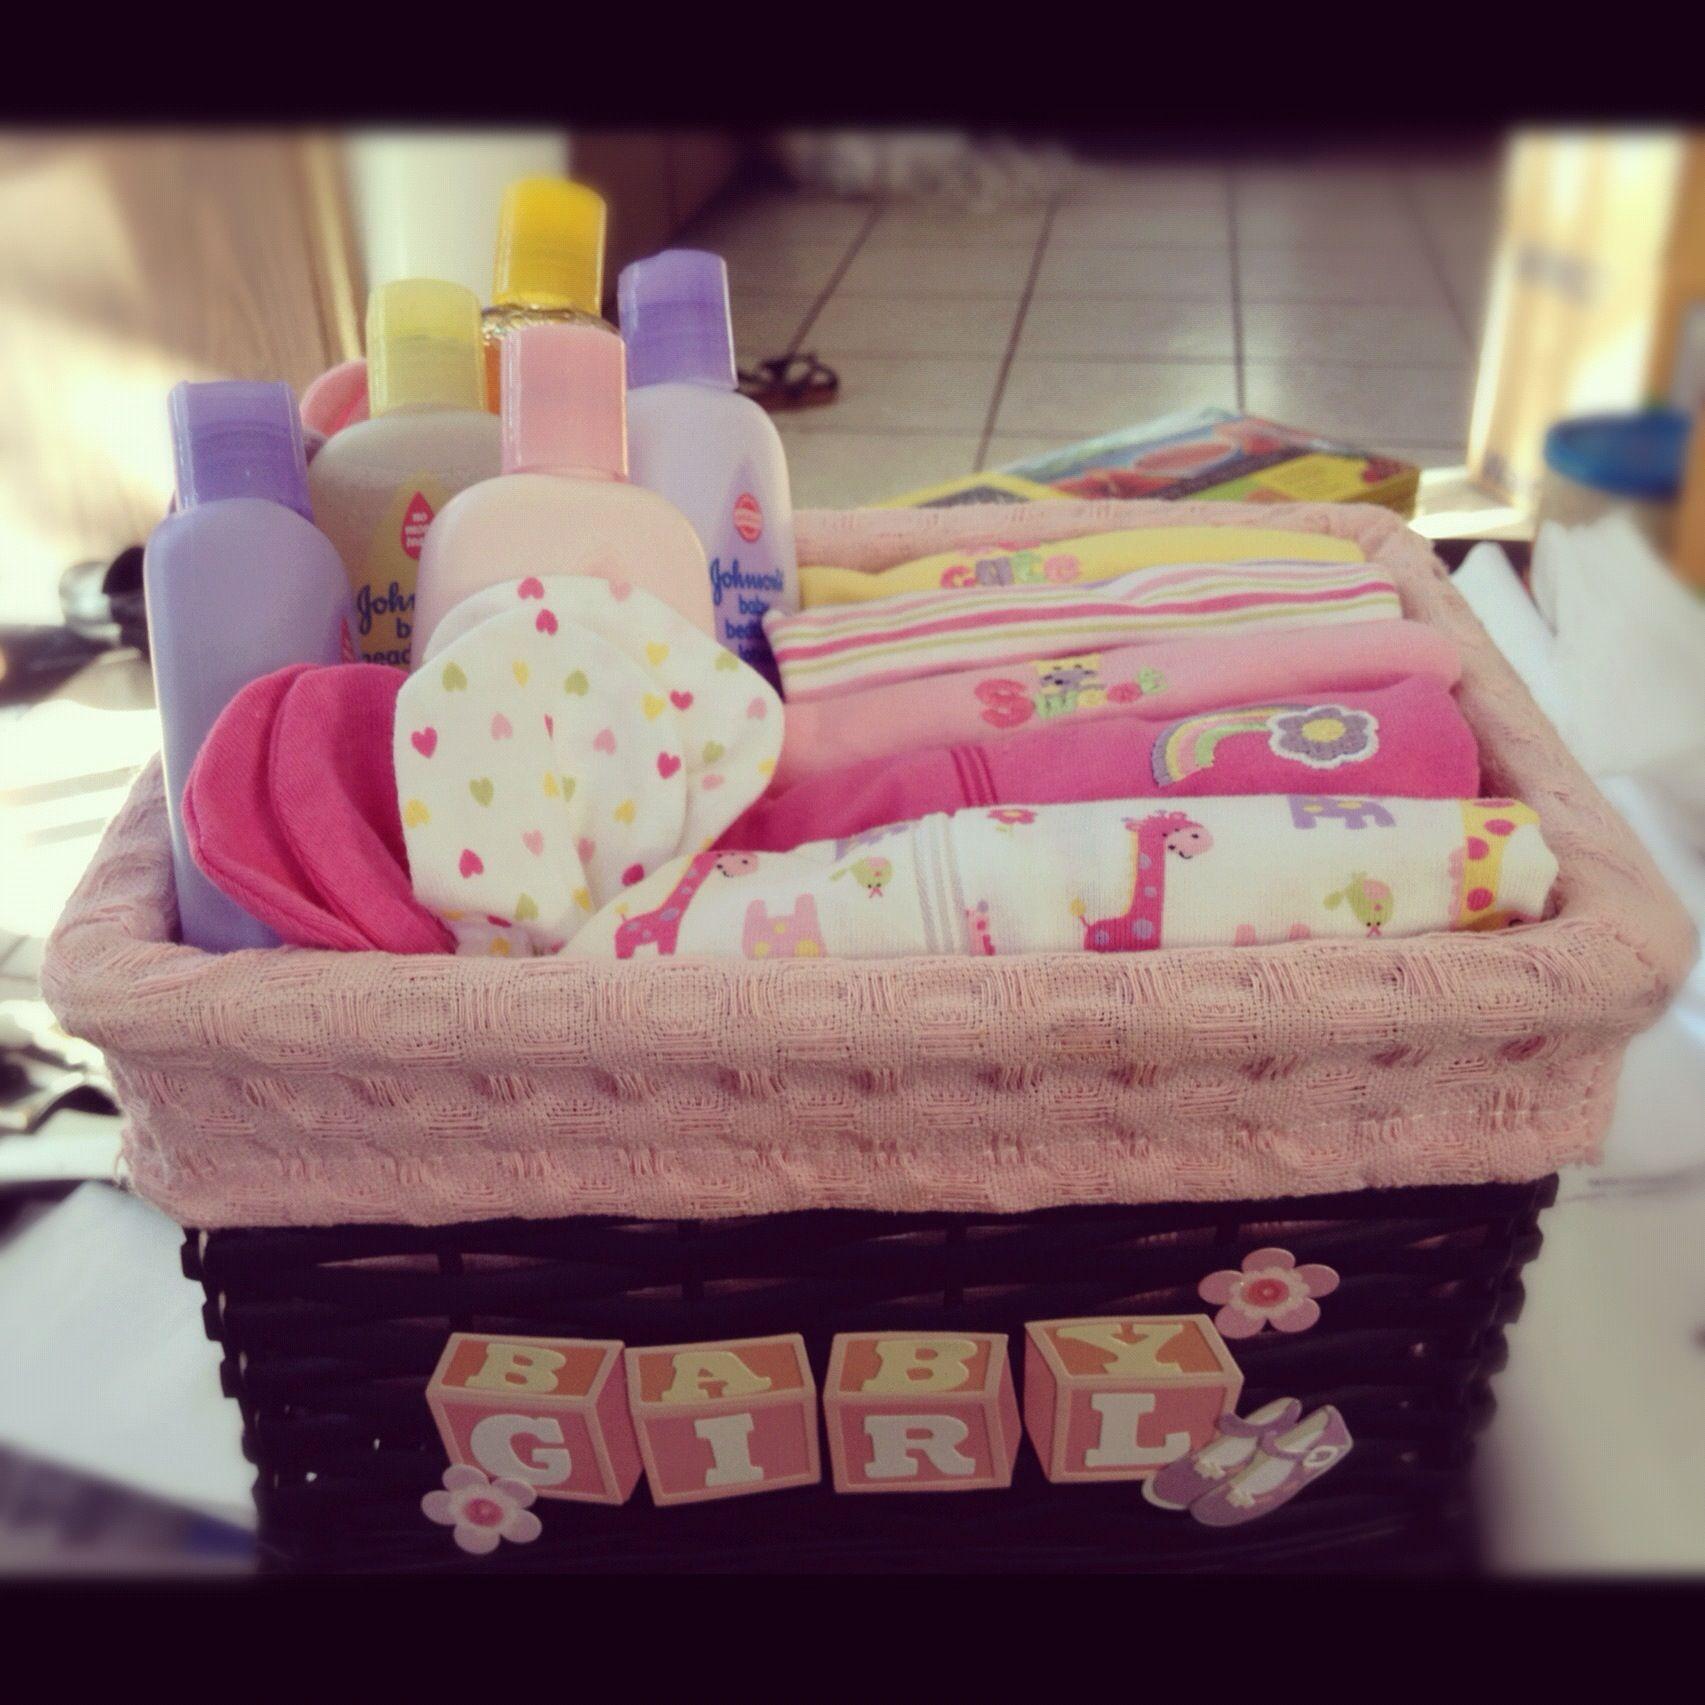 Best ideas about Baby Shower Gift Basket Ideas . Save or Pin DIY Baby Shower Gift Basket Ideas for Girls Now.